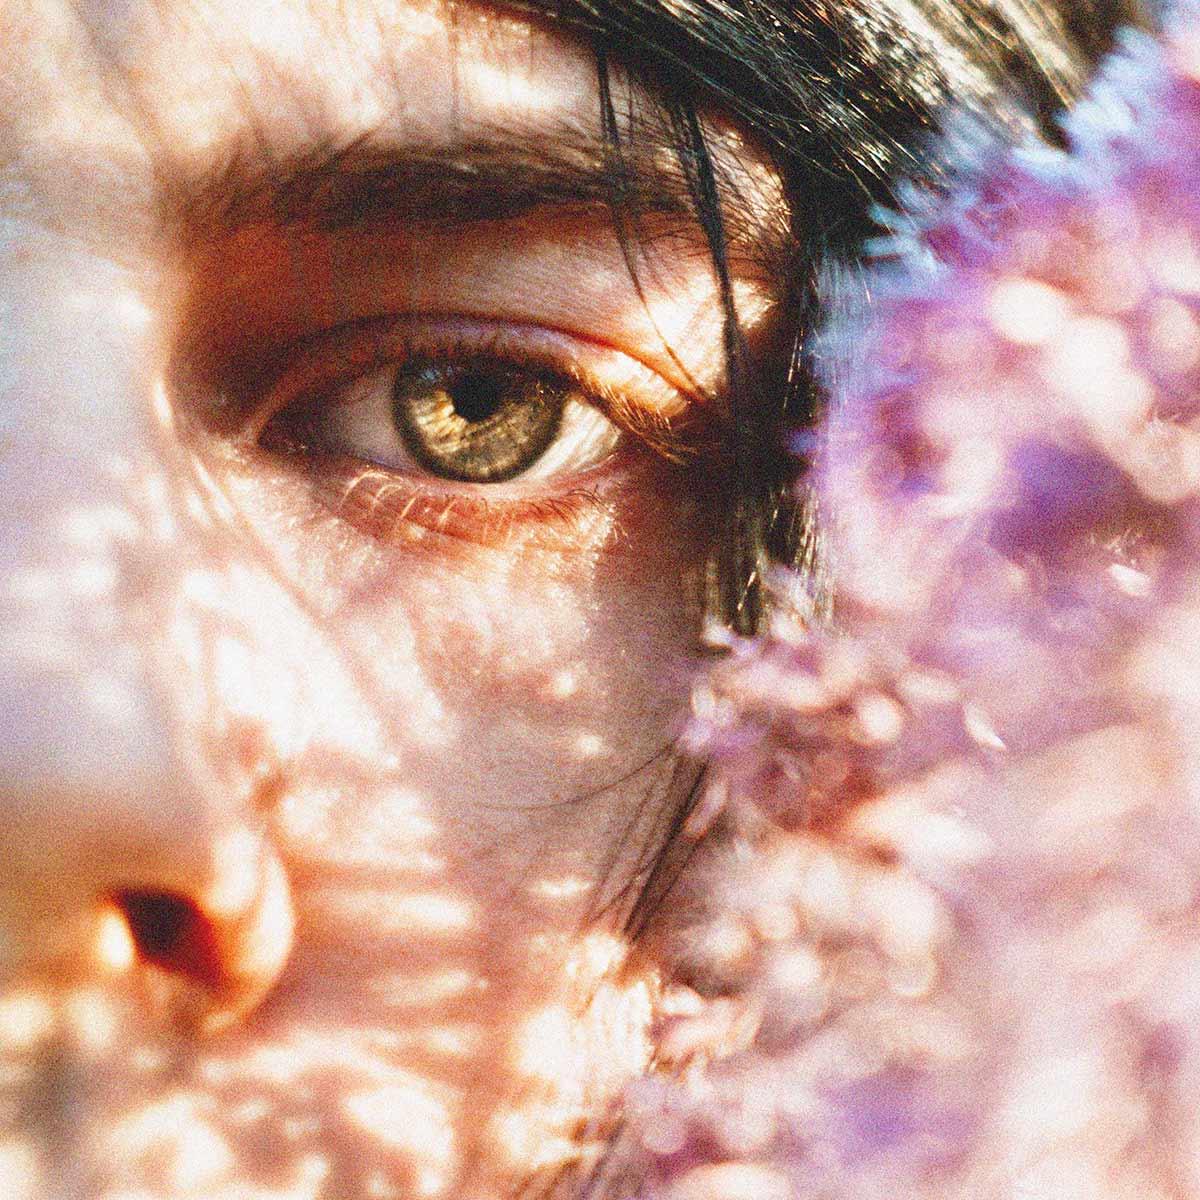 man green eyes in a zoom shot